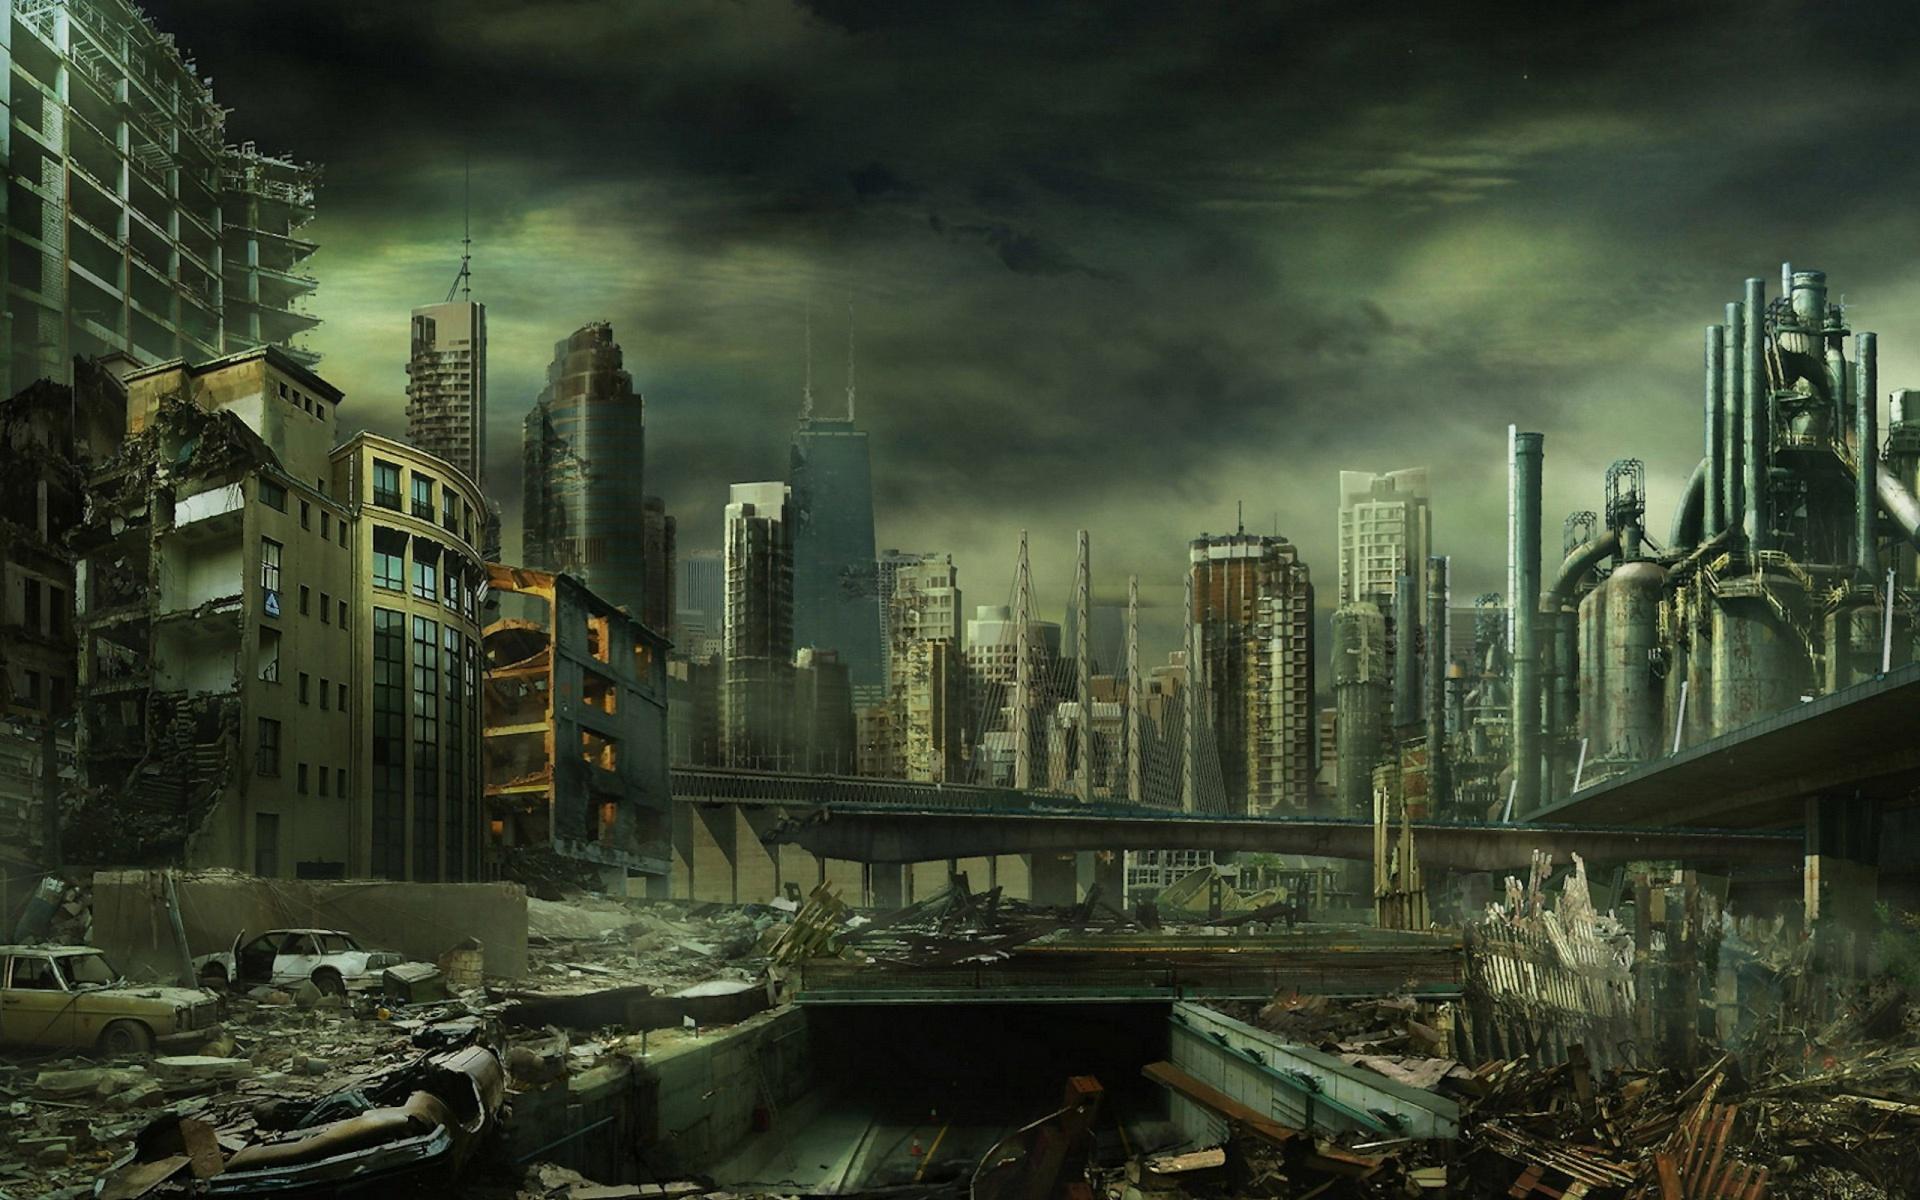 Destroyed City Wallpaper   1920x1200 1920x1200